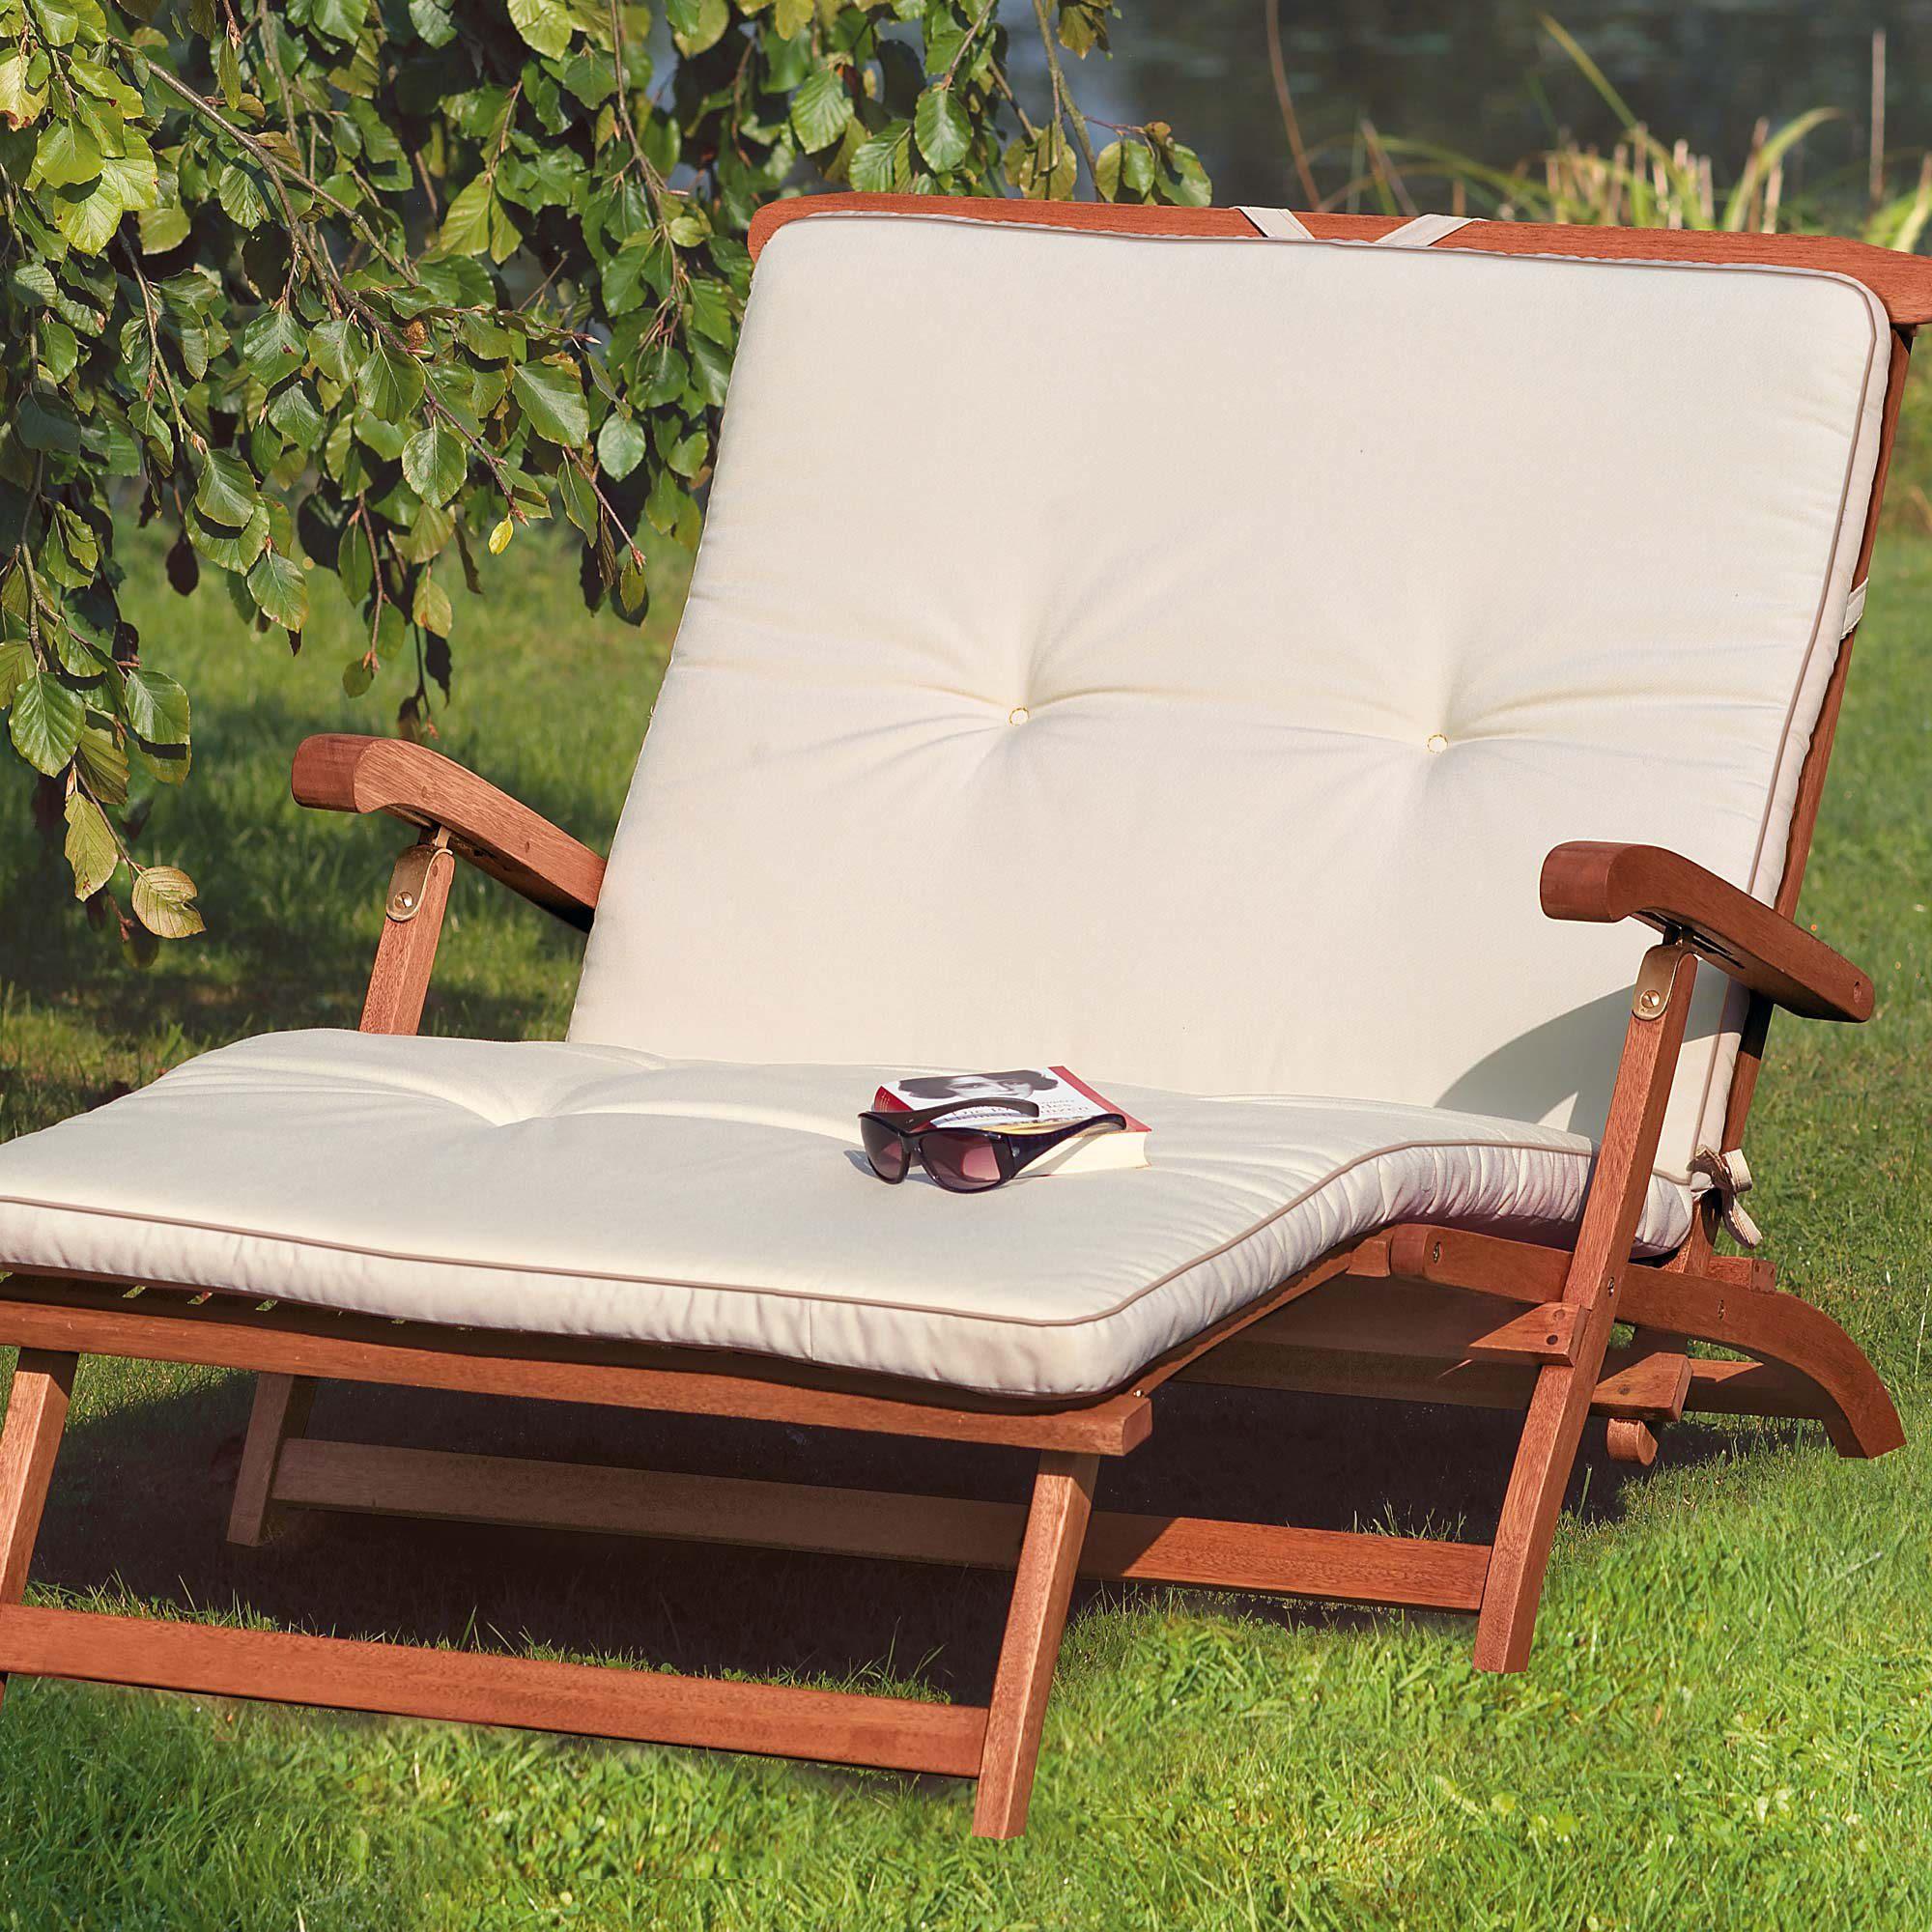 gartenliege holz mit auflage. Black Bedroom Furniture Sets. Home Design Ideas